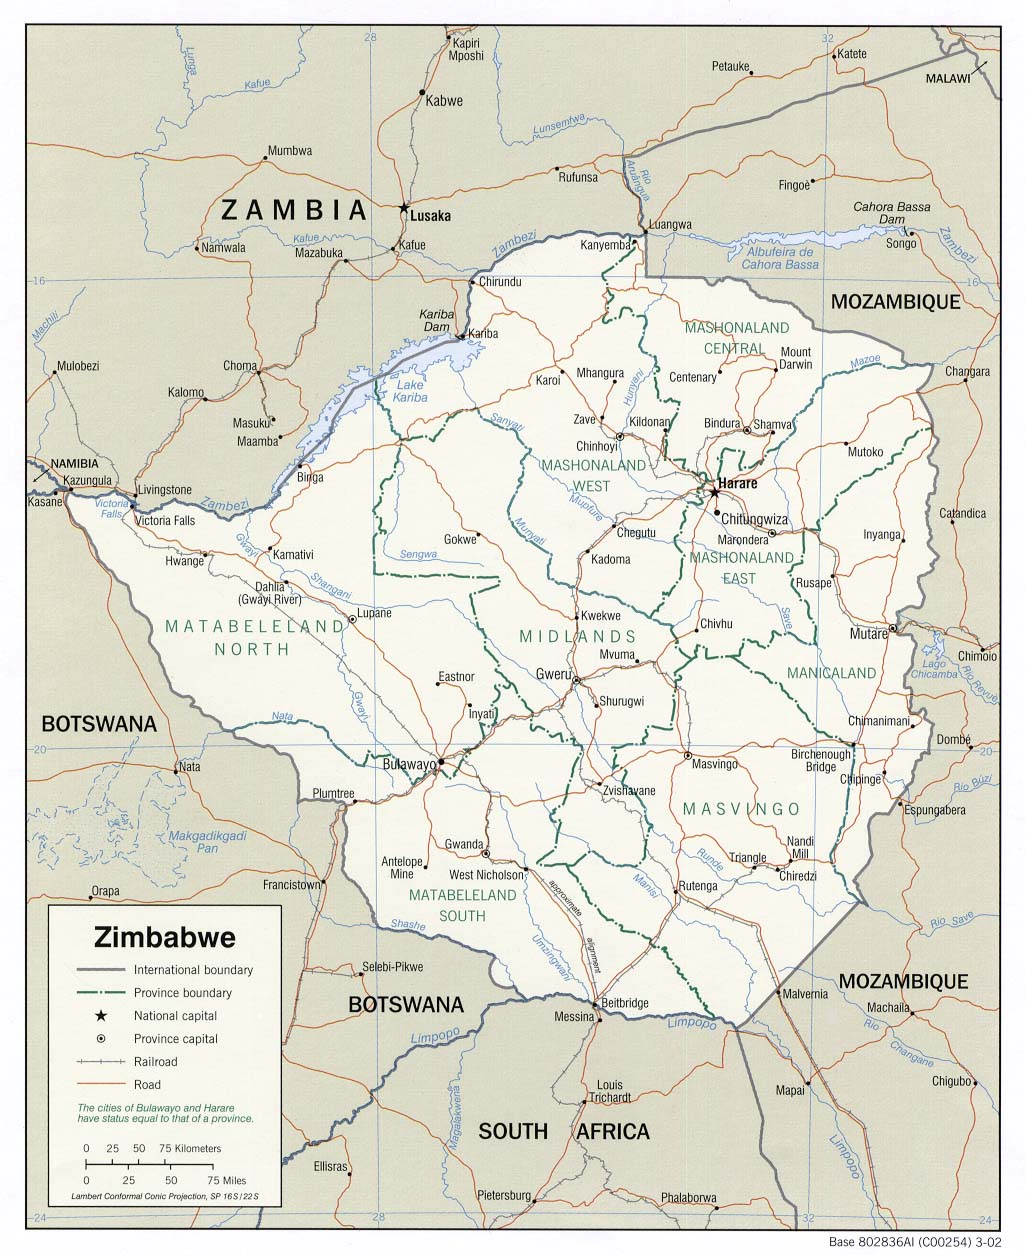 Download free zimbabwe maps gumiabroncs Image collections